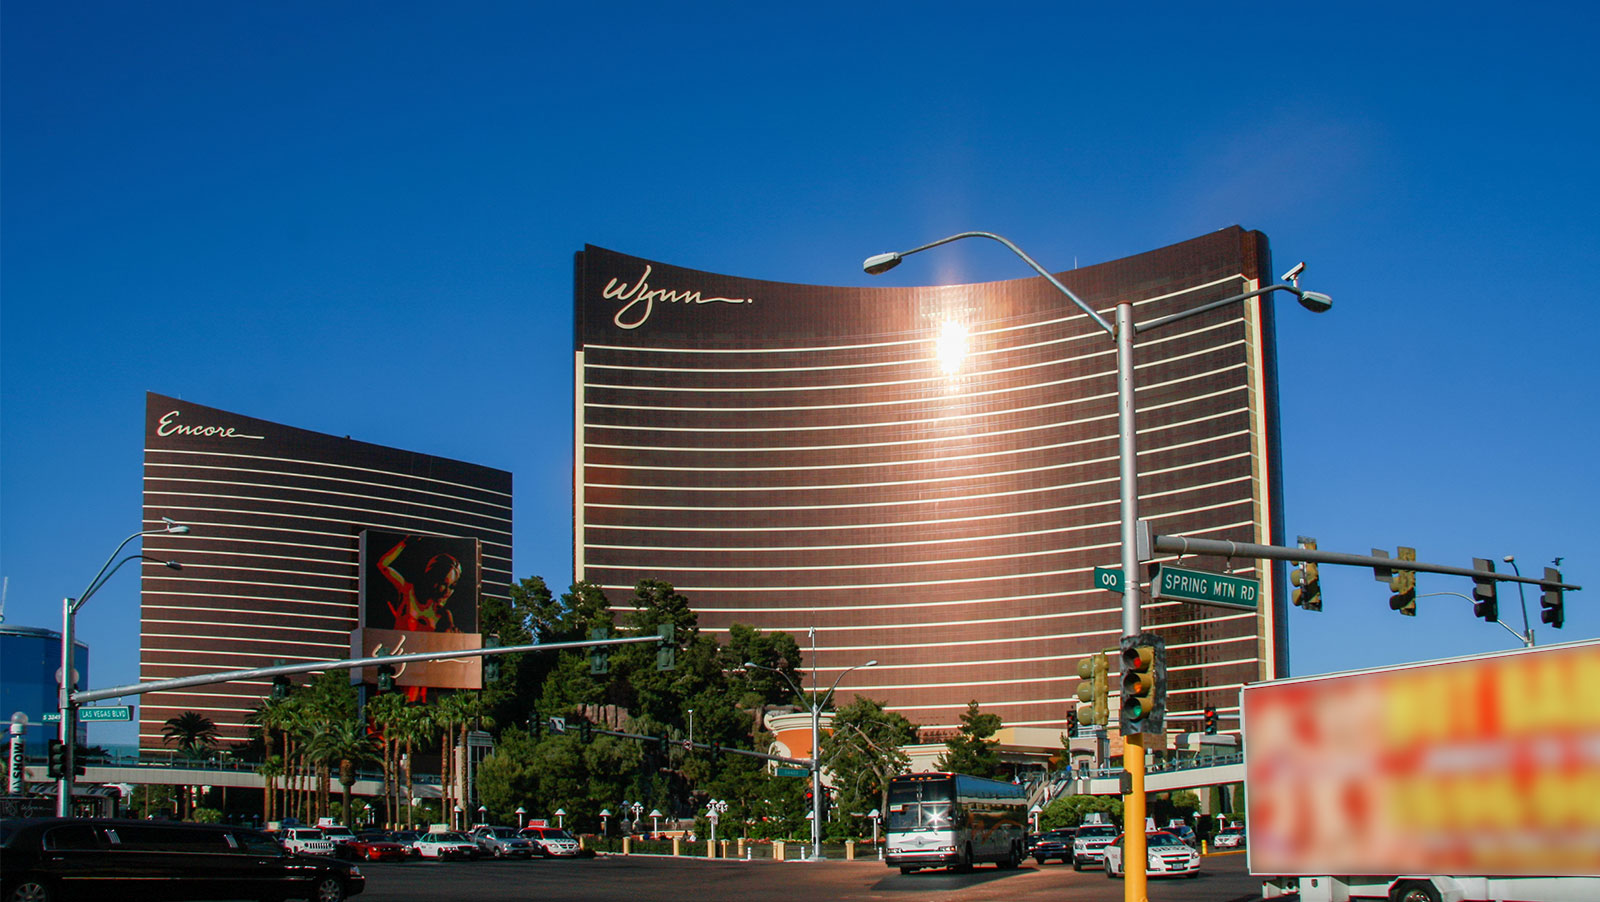 Galaxy picks up 5.3M shares in troubled Wynn Resorts